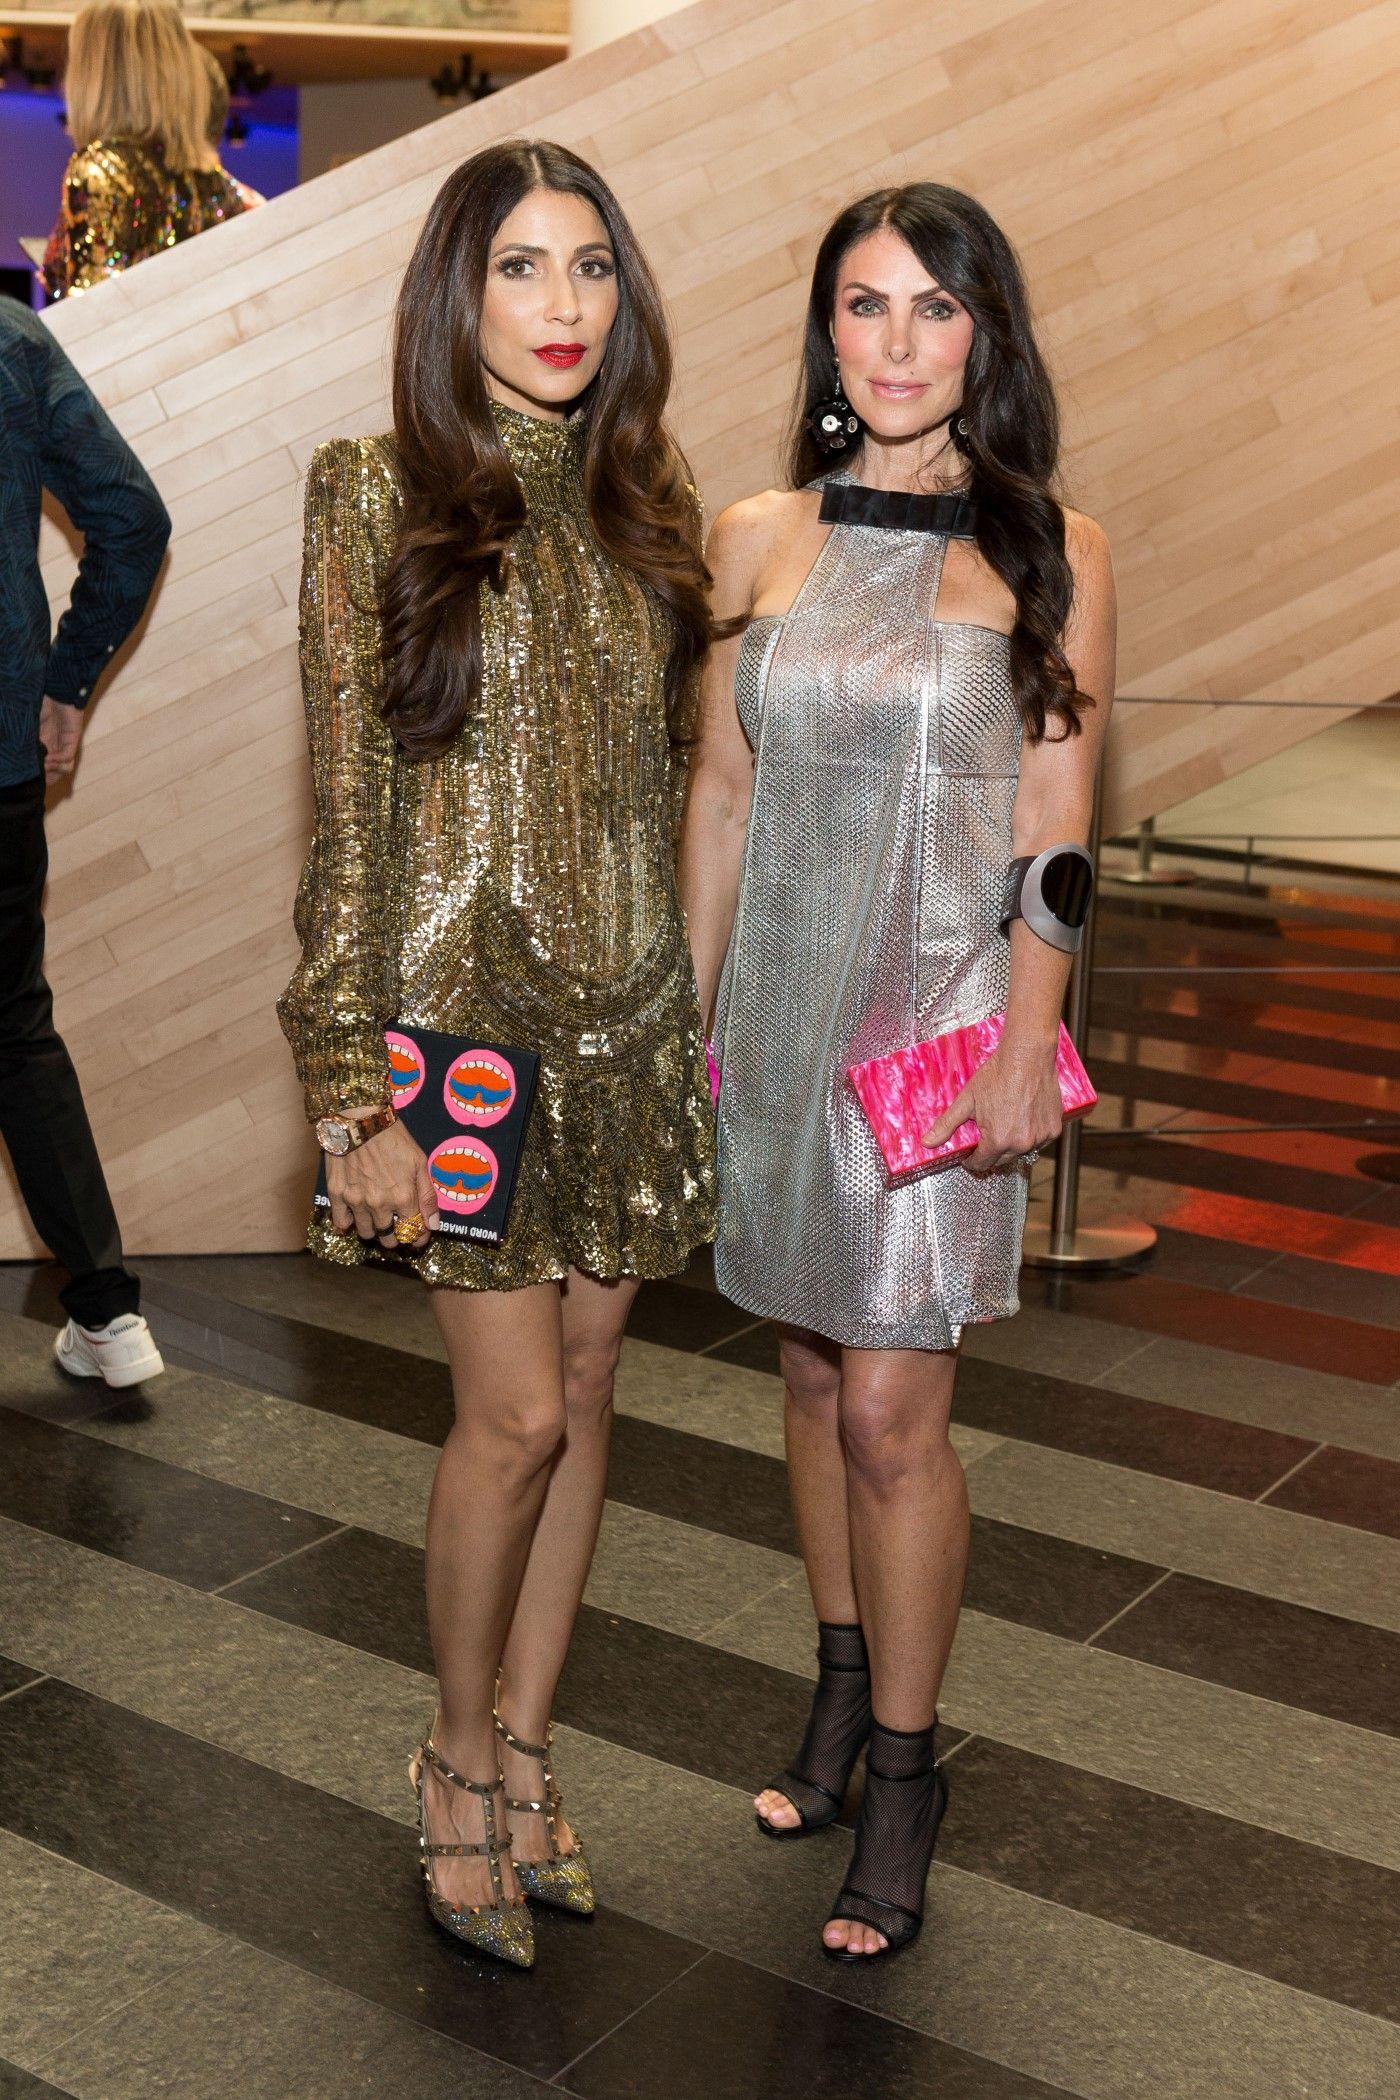 Sobia Shaikh and Lisa Zabelle